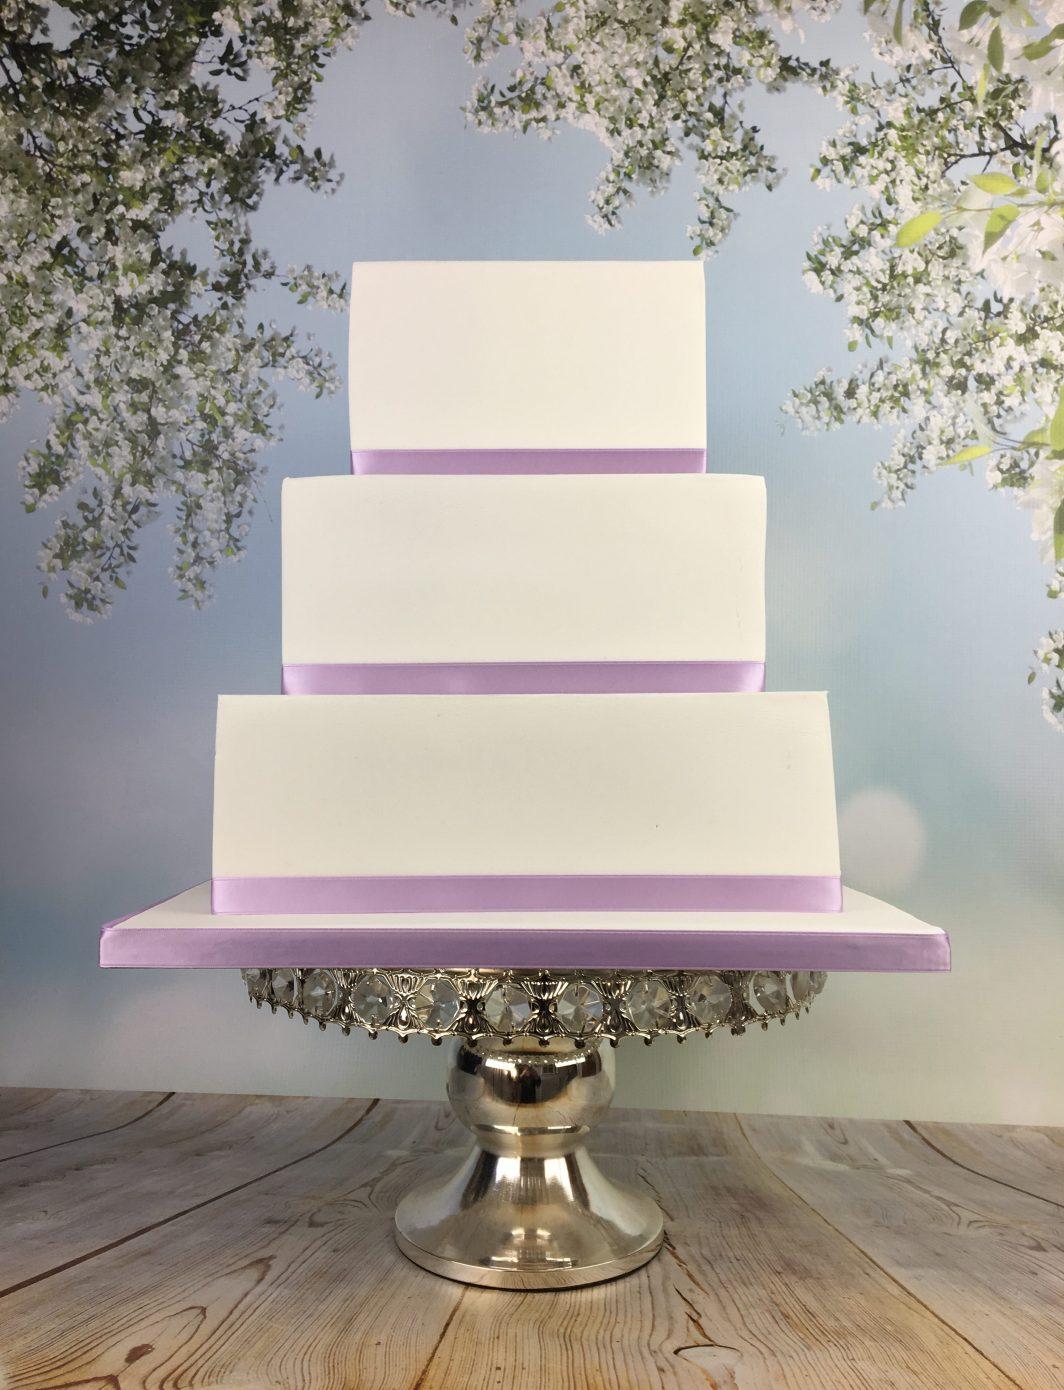 Sharp edges square wedding cake